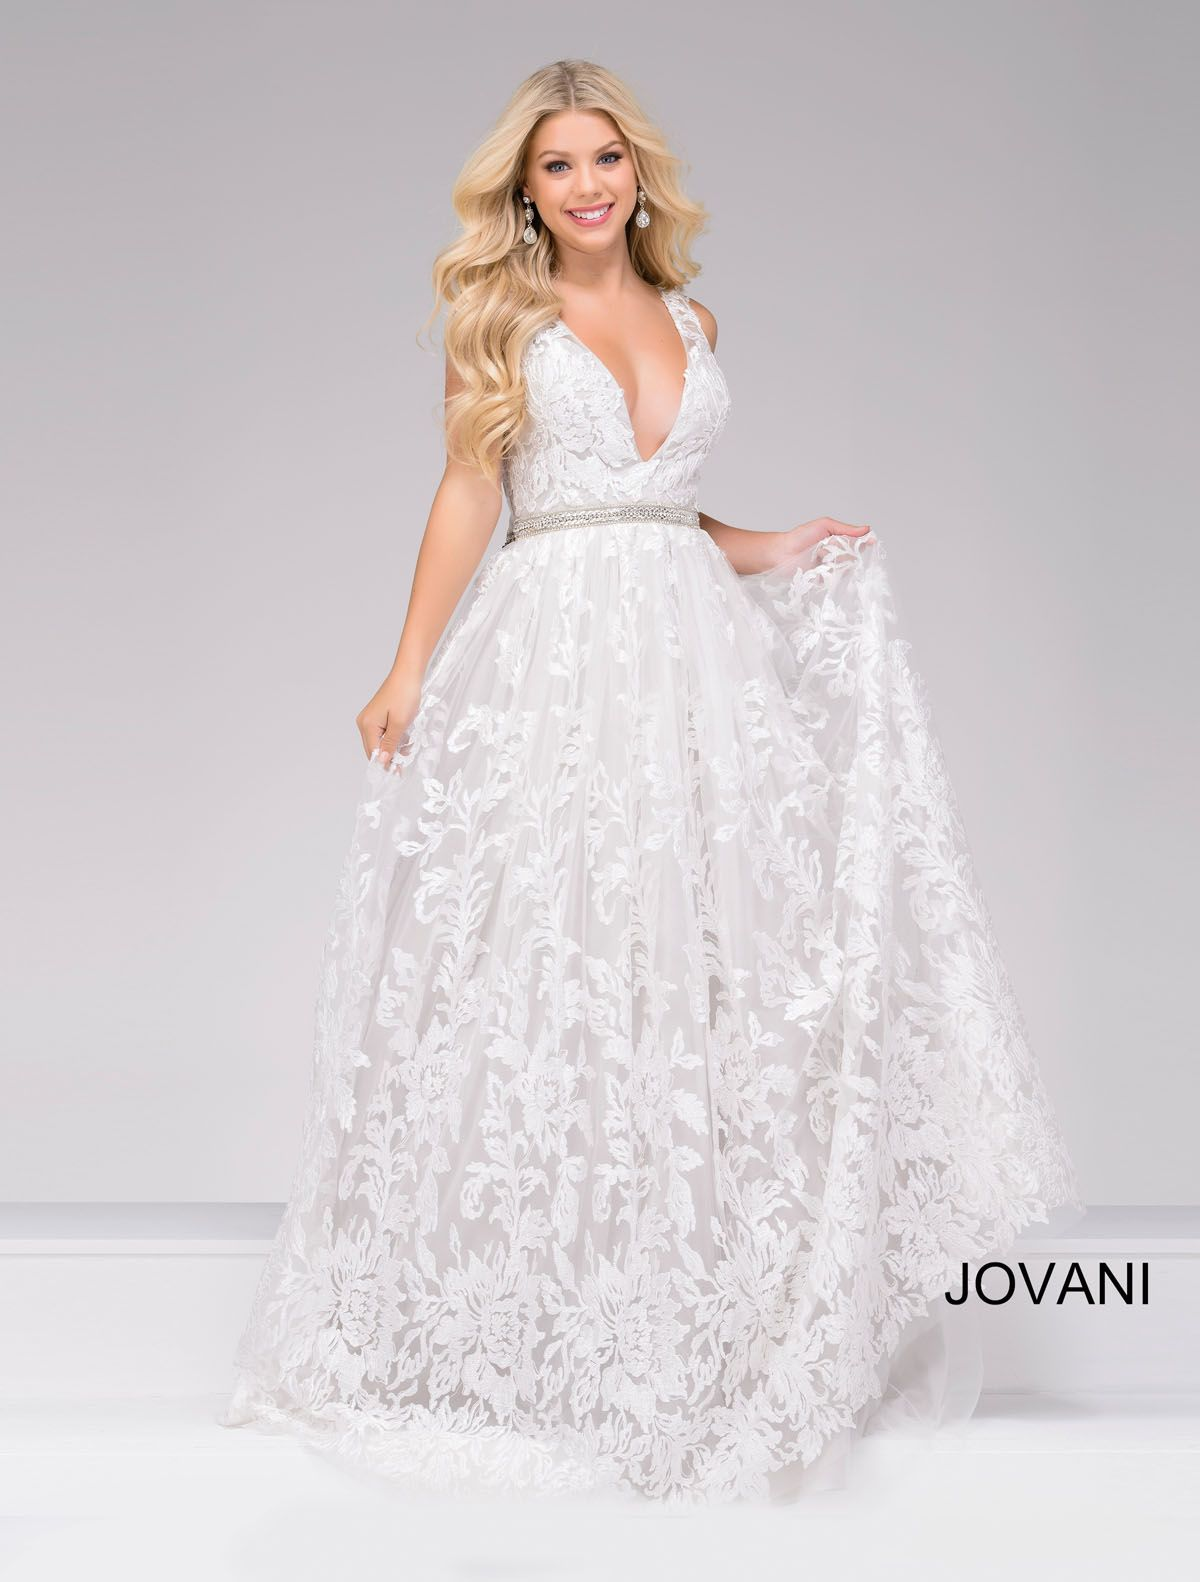 Atlanta wedding dress shops  Jovani   International Prom Association  Jovani Prom Dresses